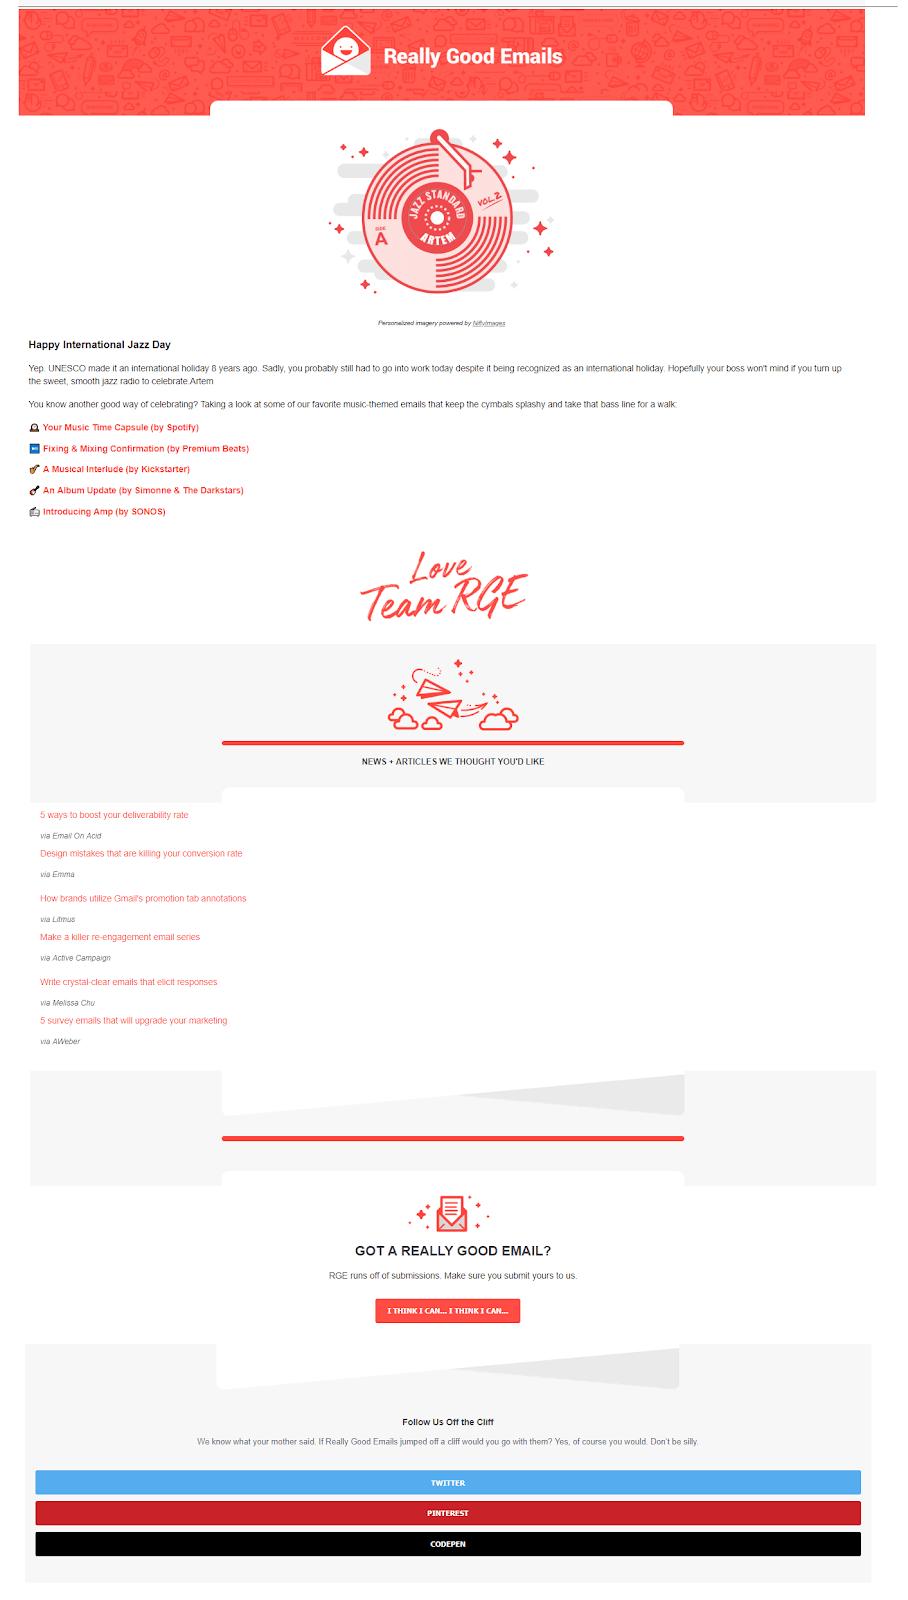 Рассылка Really Good Emails